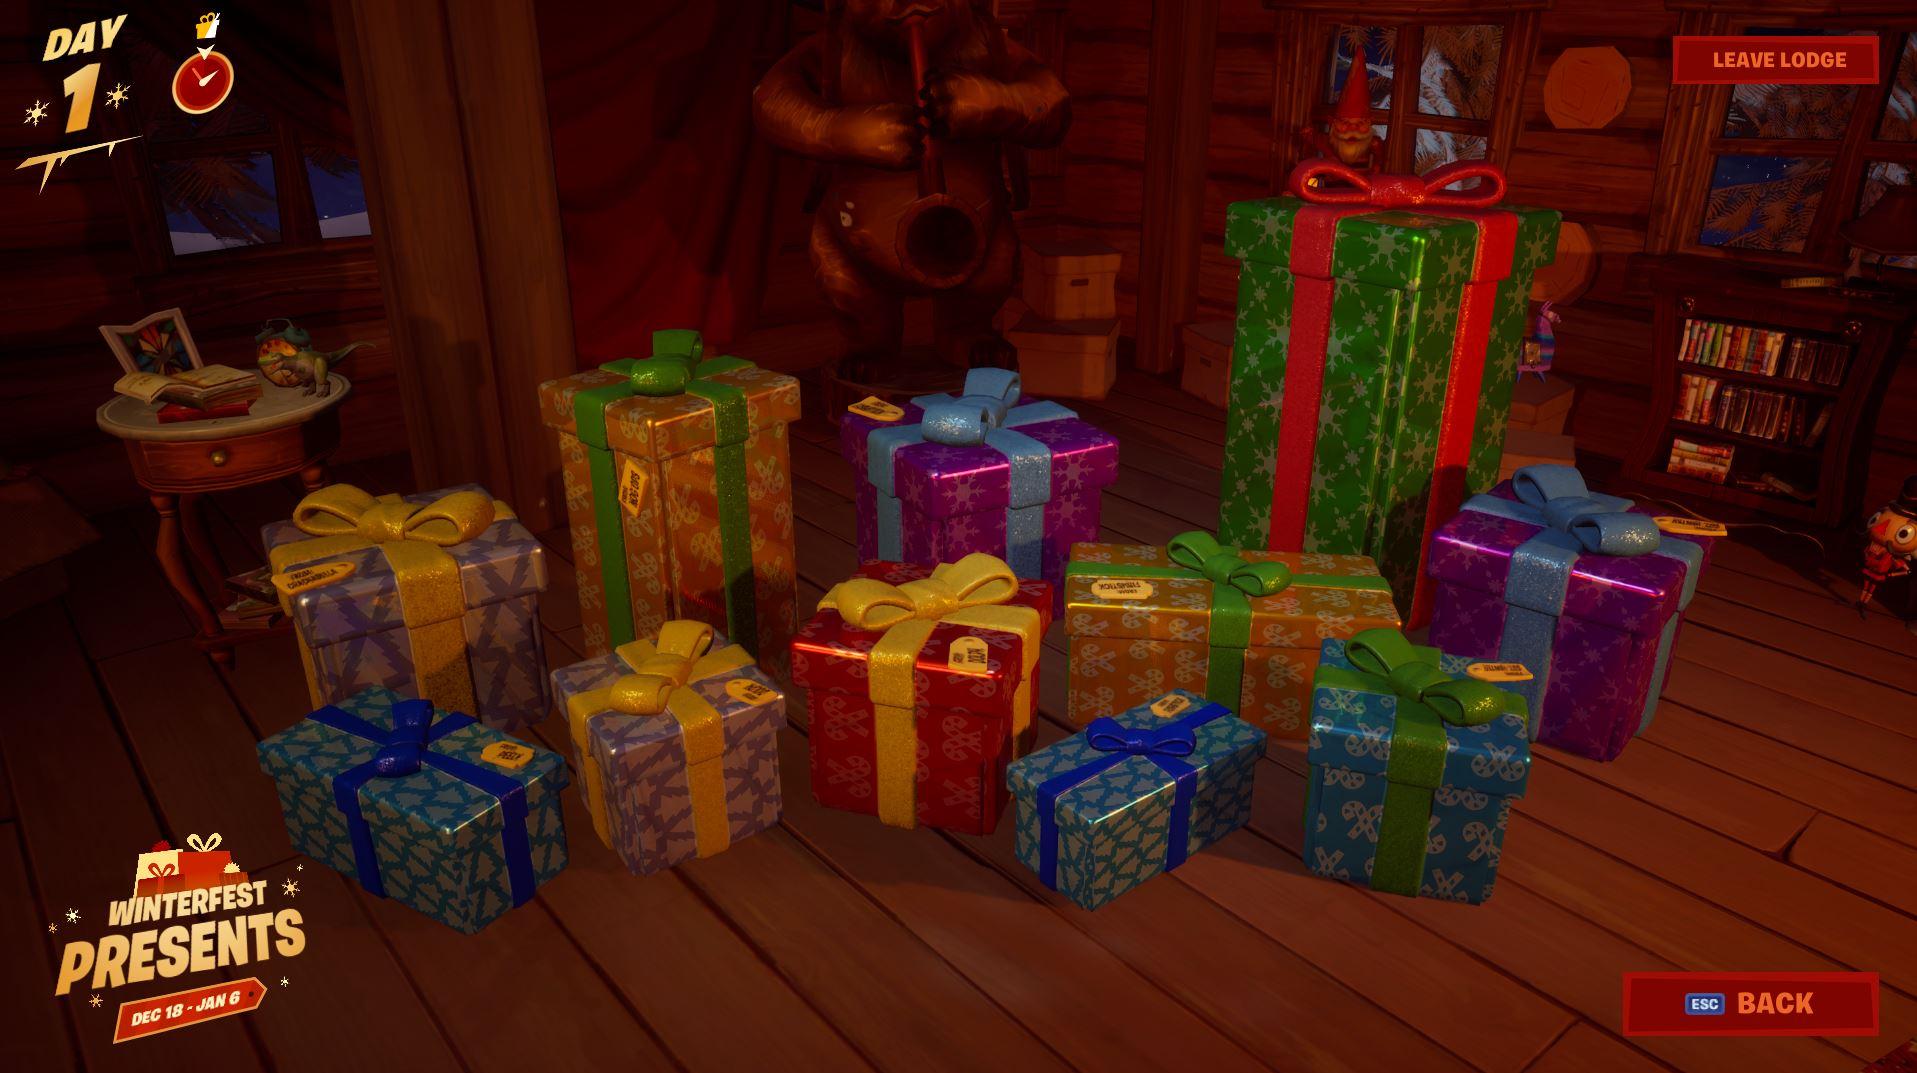 Fortnite Presents